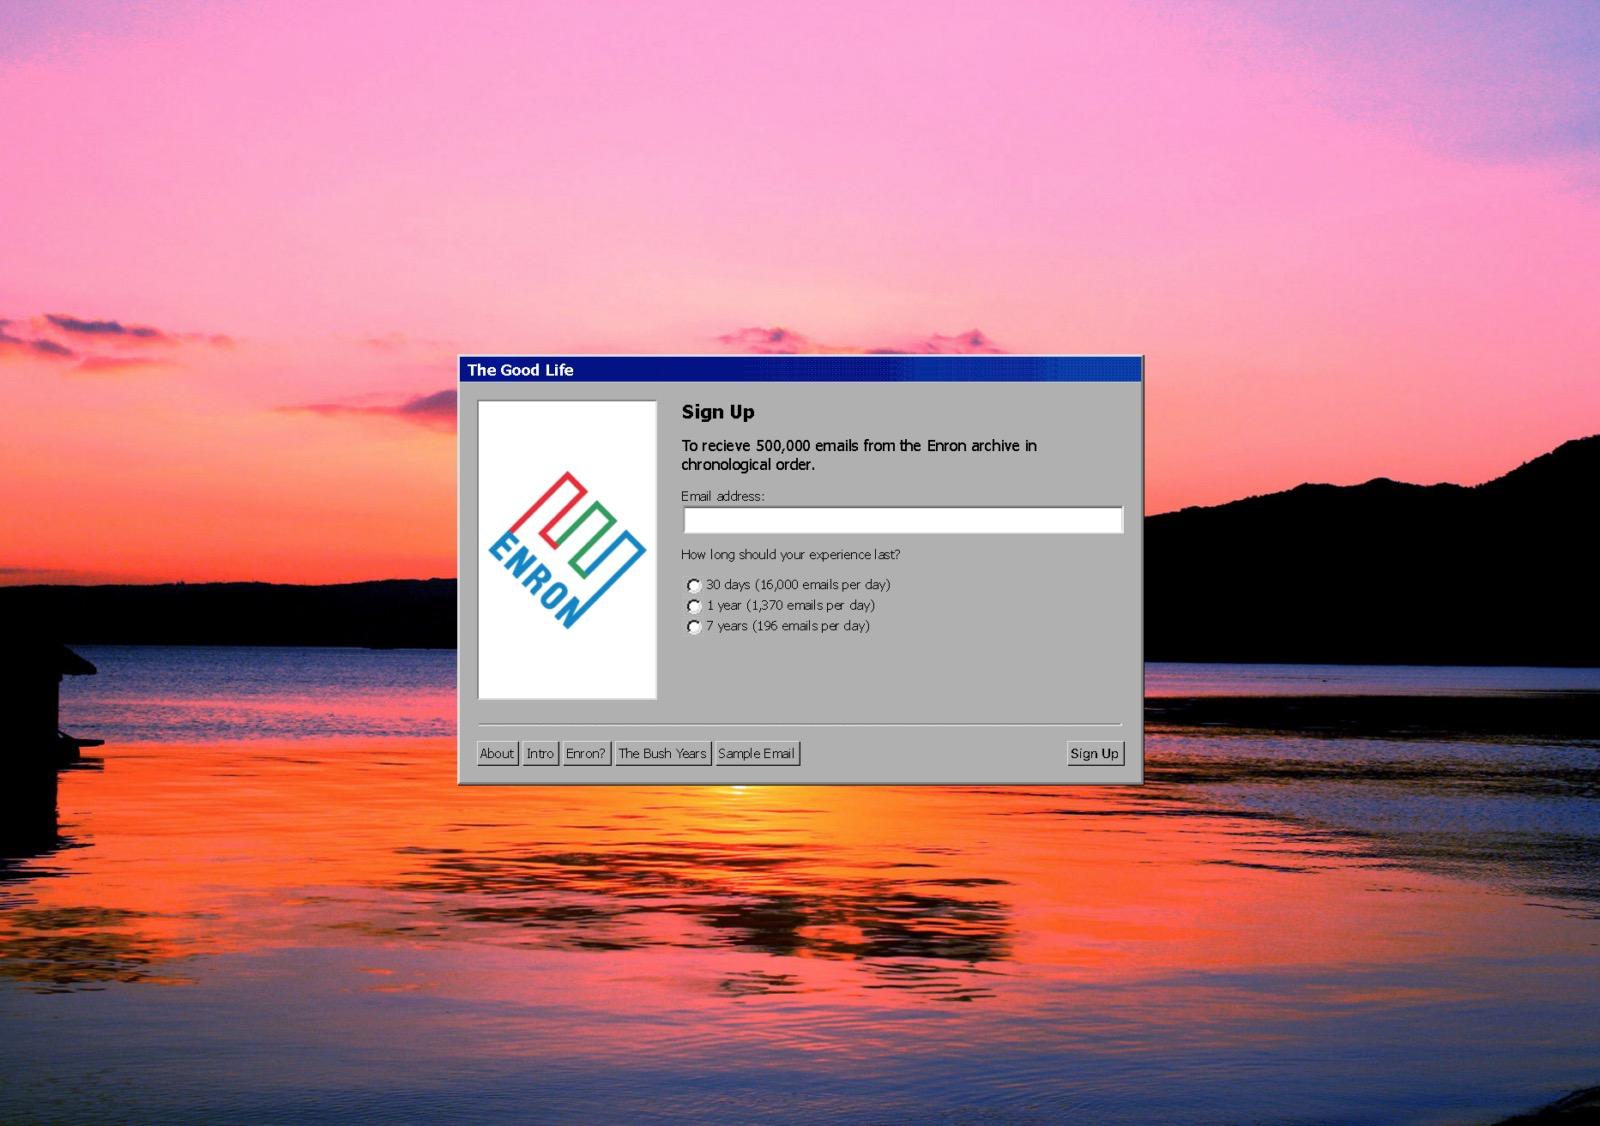 enron-email-simulator-signup-e1480447898862